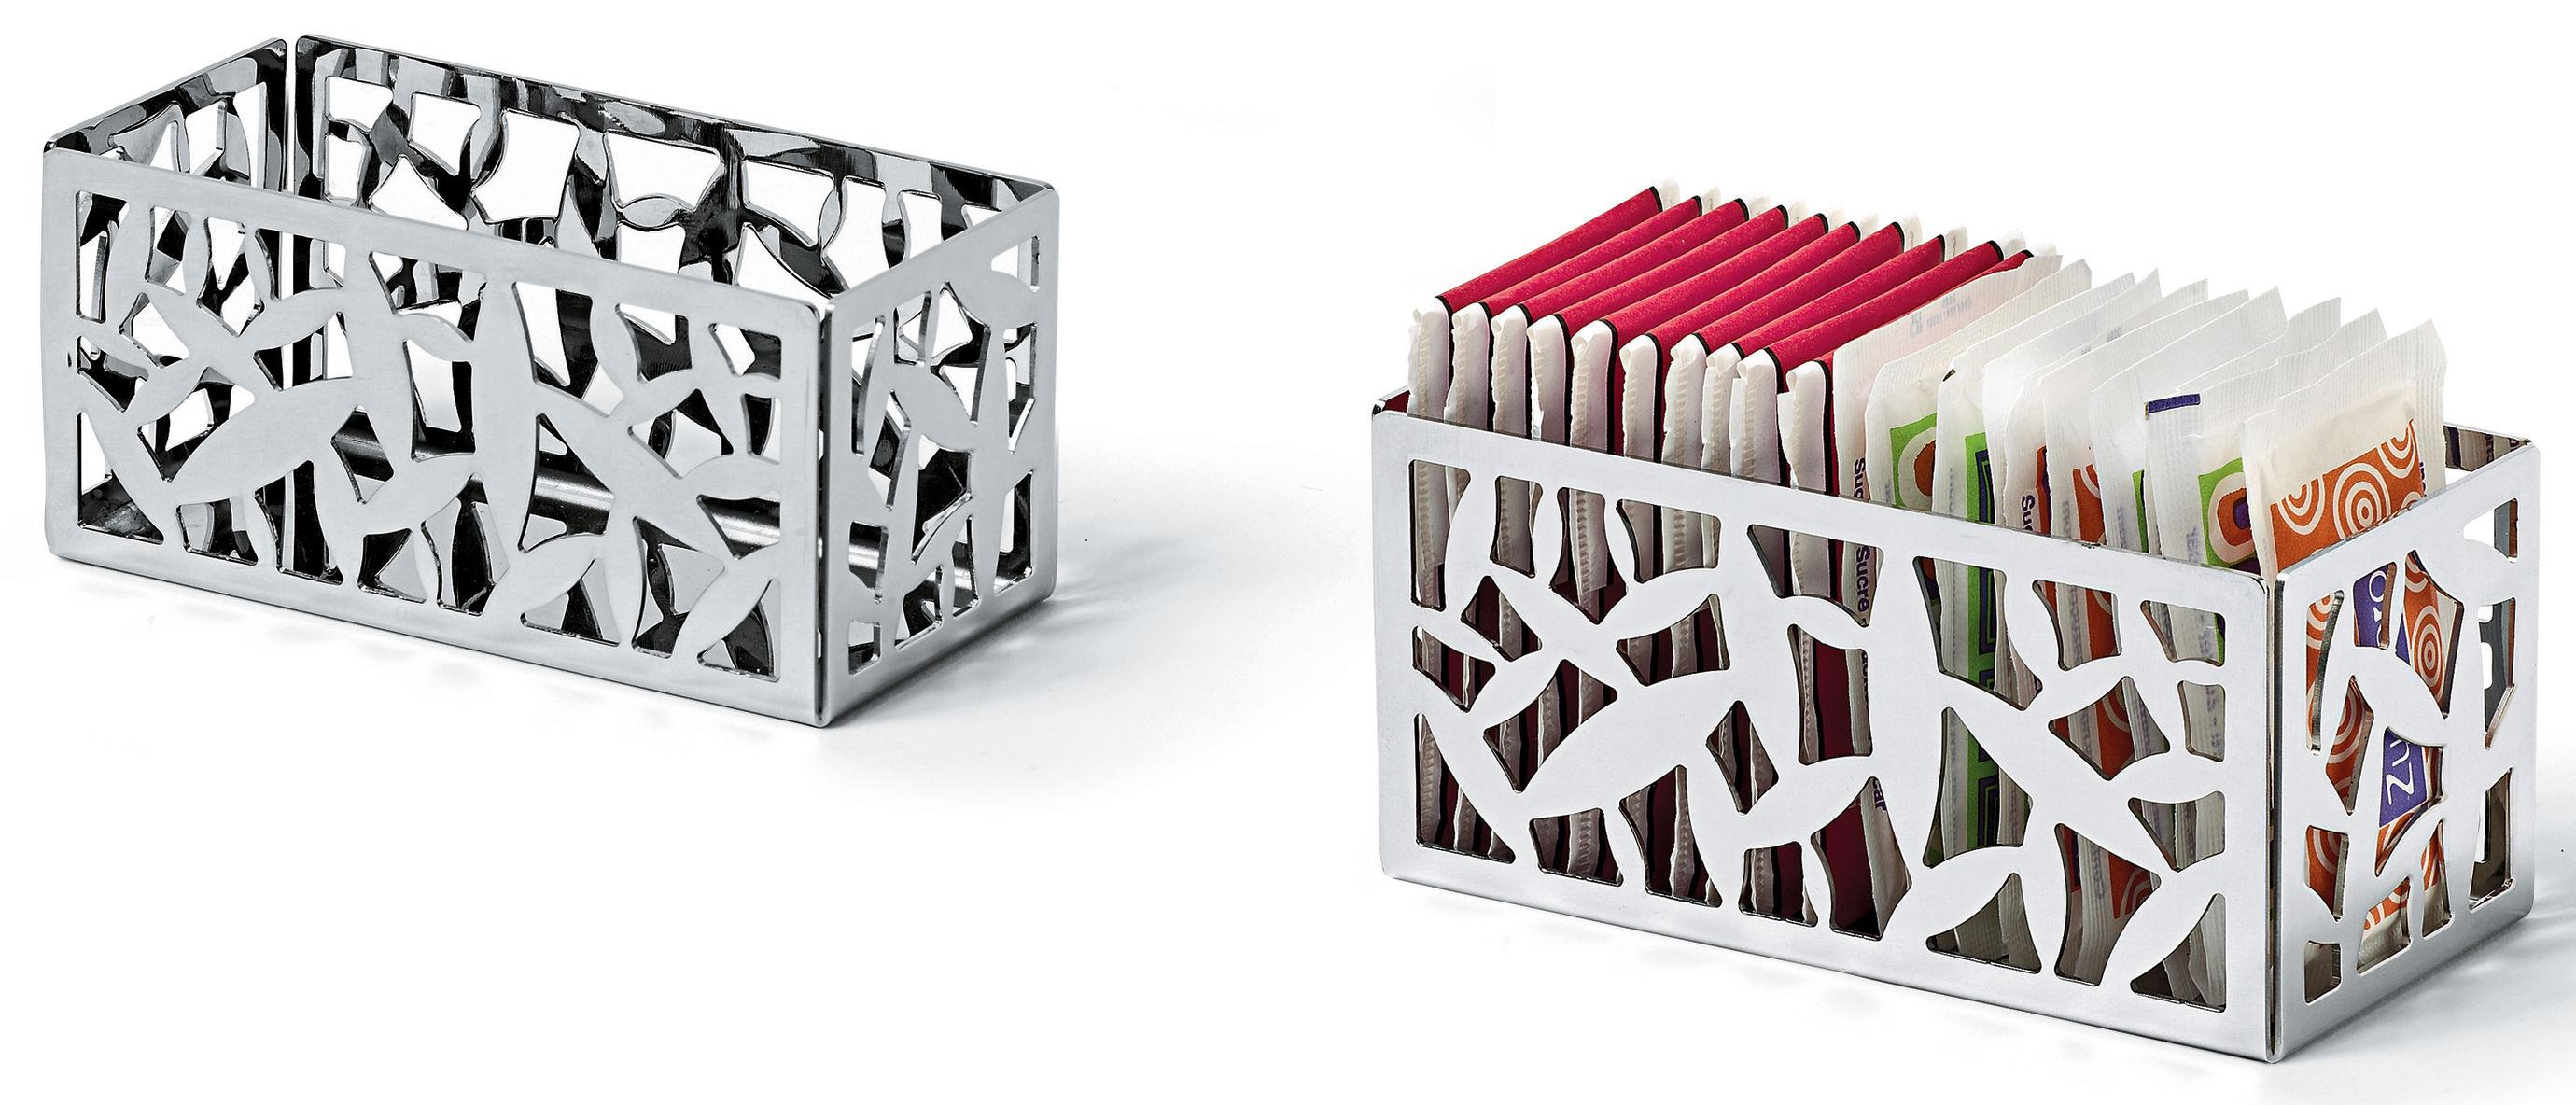 Porte sachet de th cactus acier alessi for Alessi porte prezzi